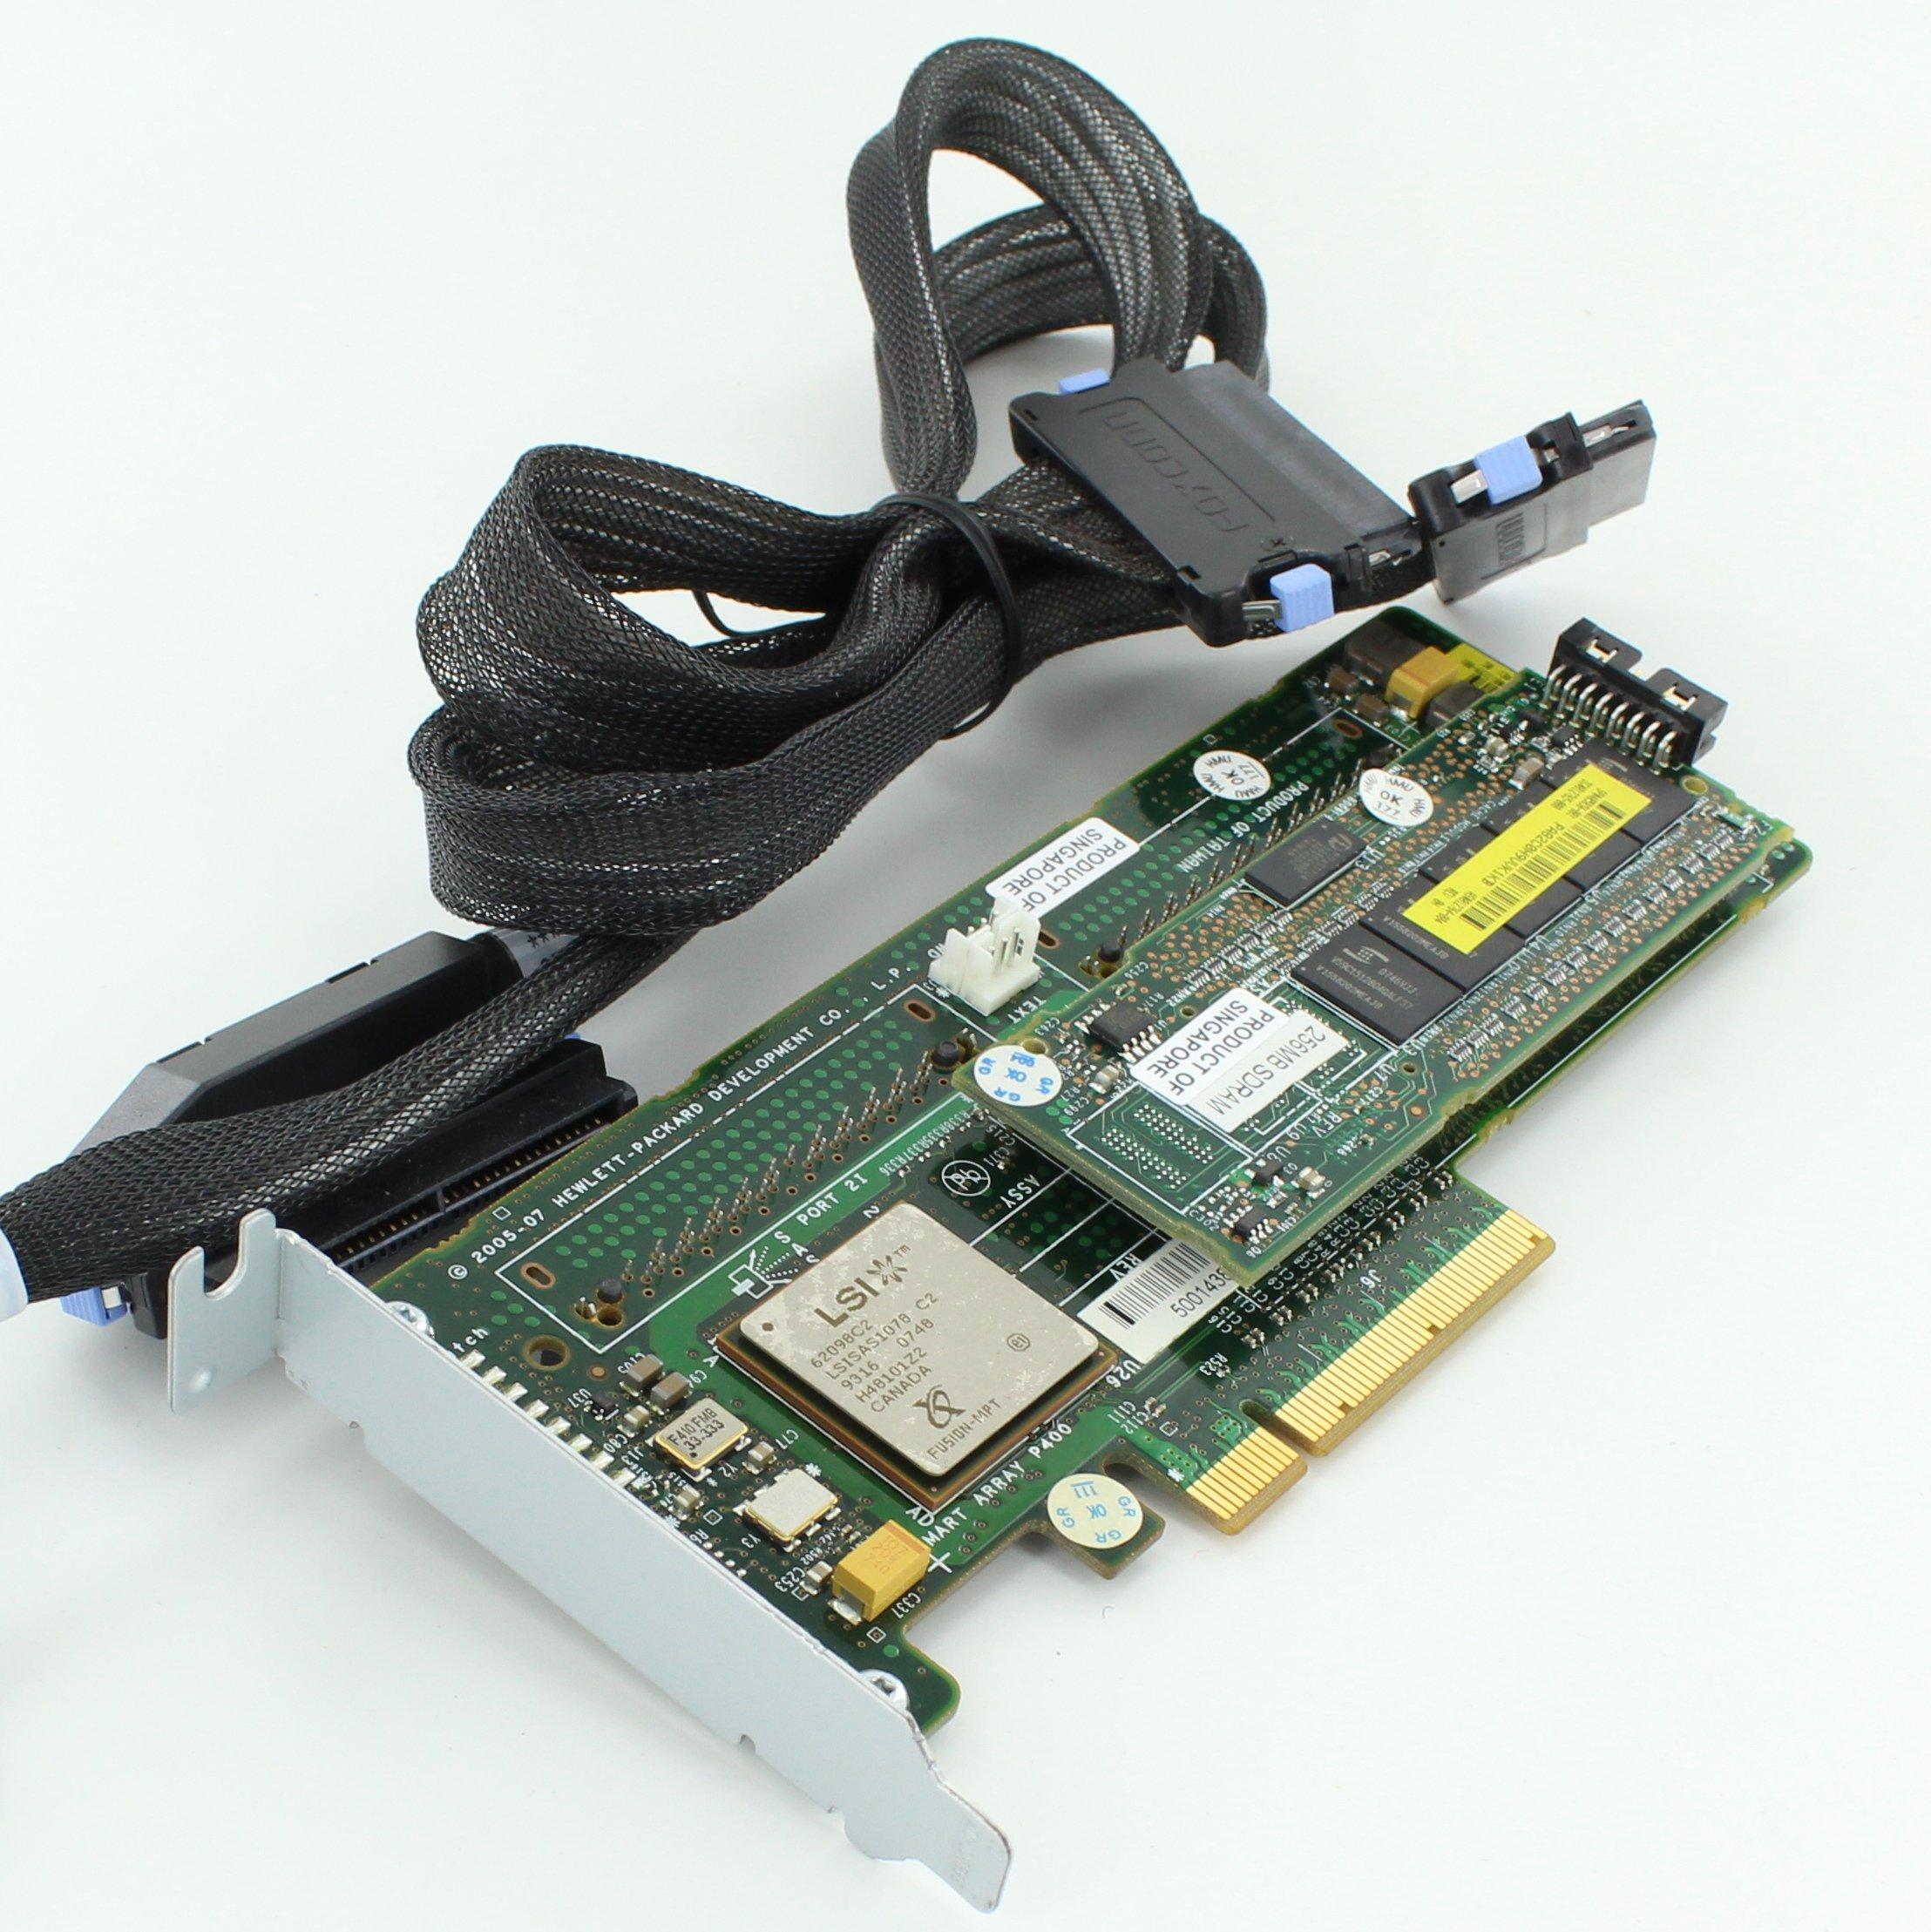 HP 405831-001 HP SMART ARRAY P400 SAS CONTROLLER aka(447029-001) (405831001) (Certified Refurbished)